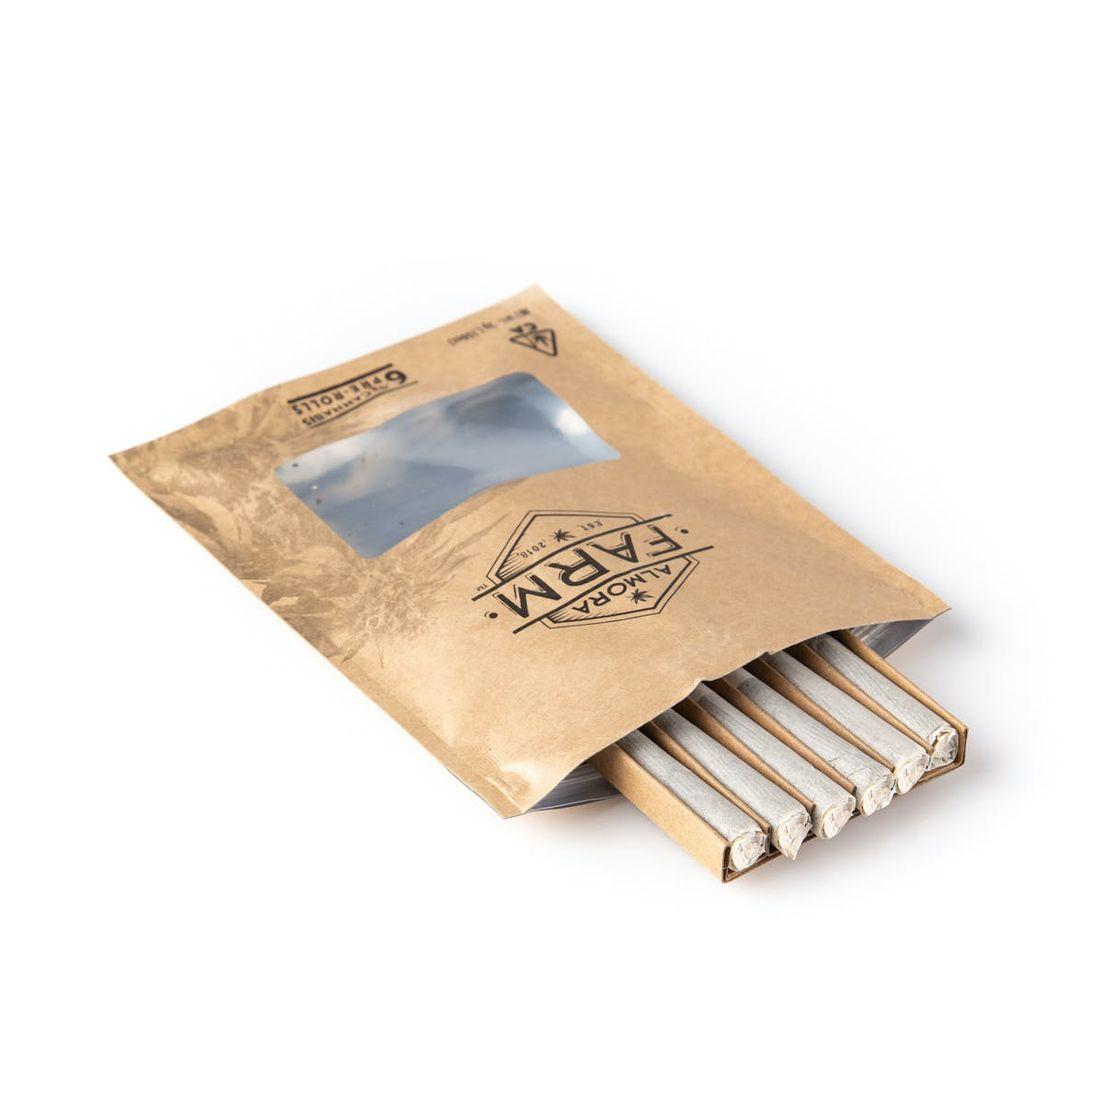 .5g Do-Si-Do (6 Pack) Pre Rolls - ALMORA FARM